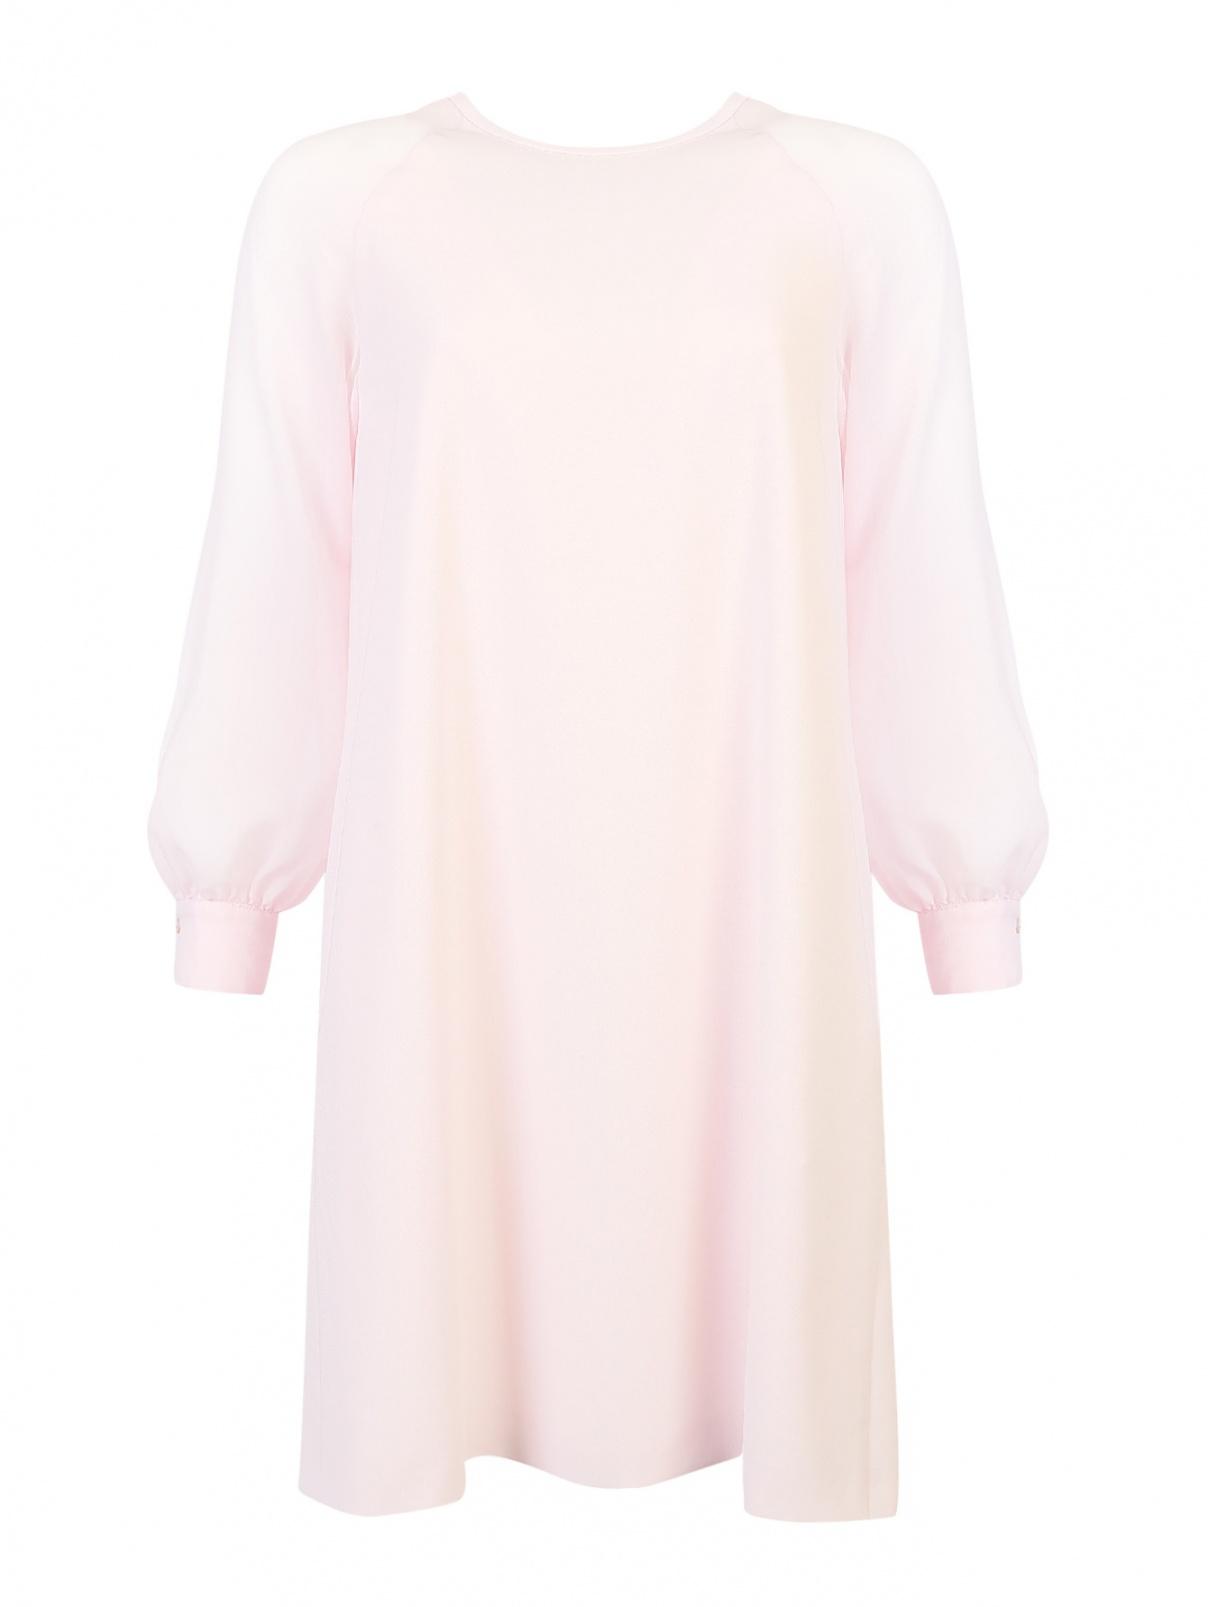 Платье А-силуэта, с прозрачными рукавами Max Mara  –  Общий вид